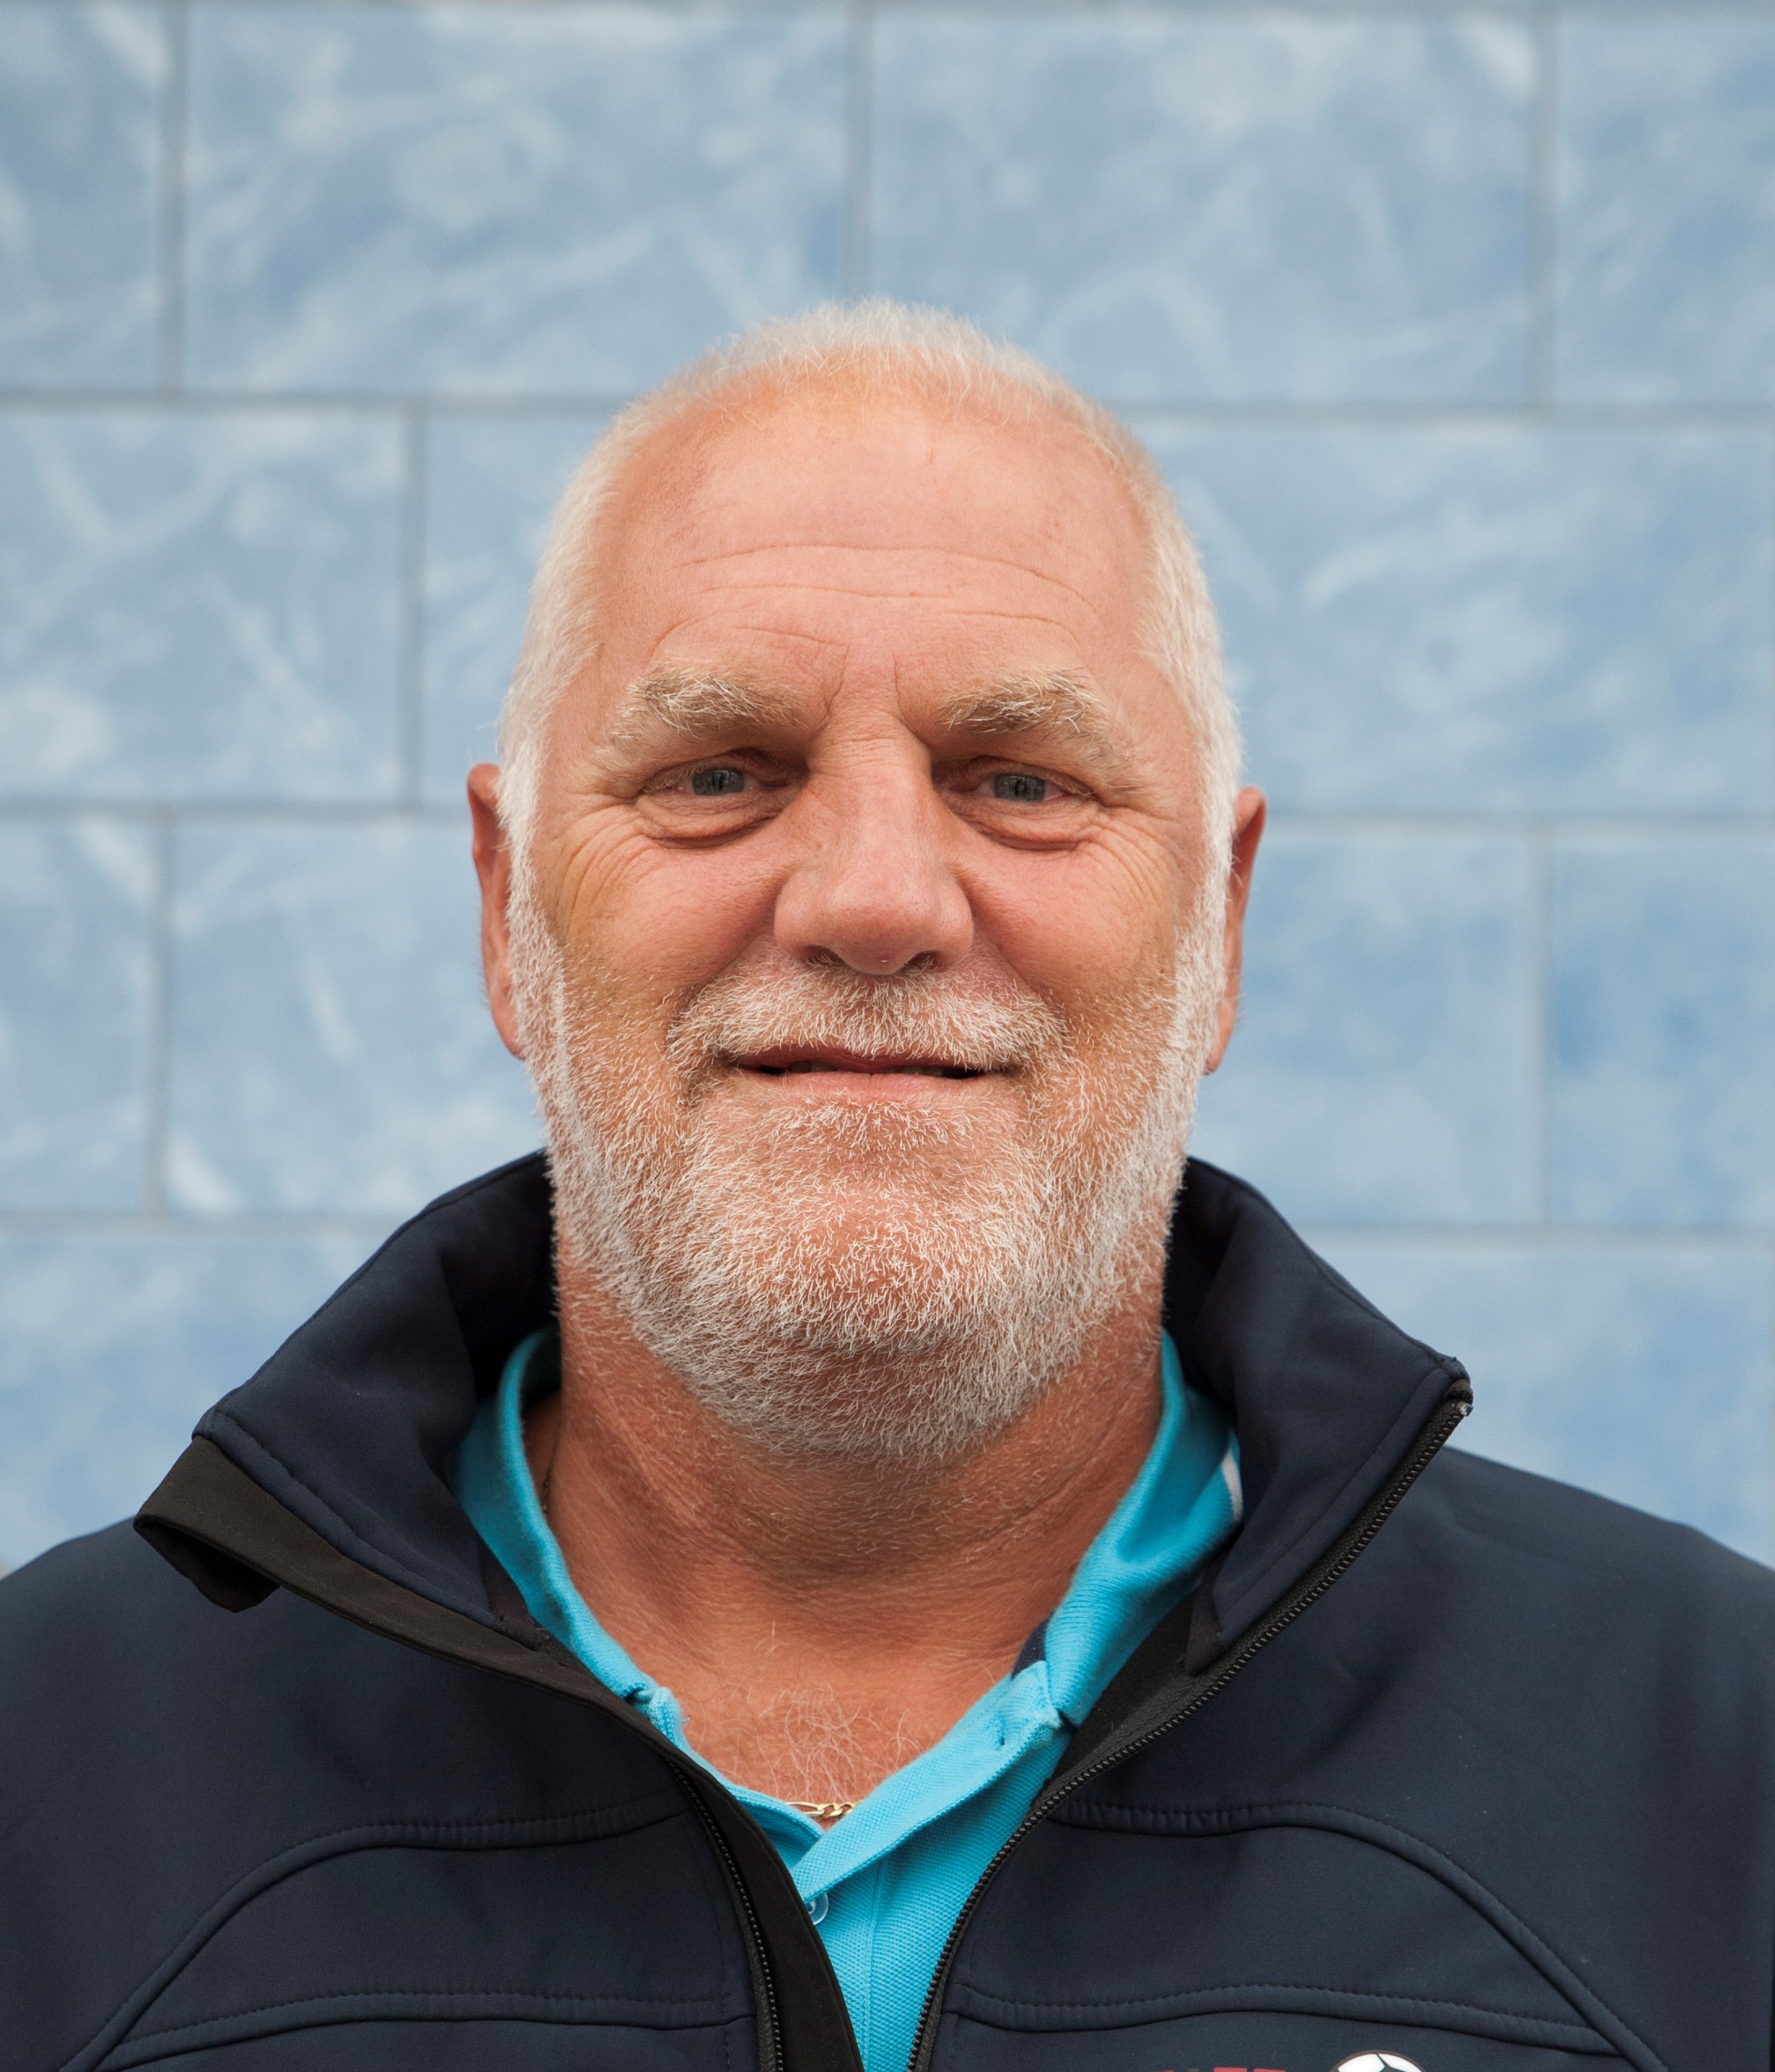 Klaas Kramer